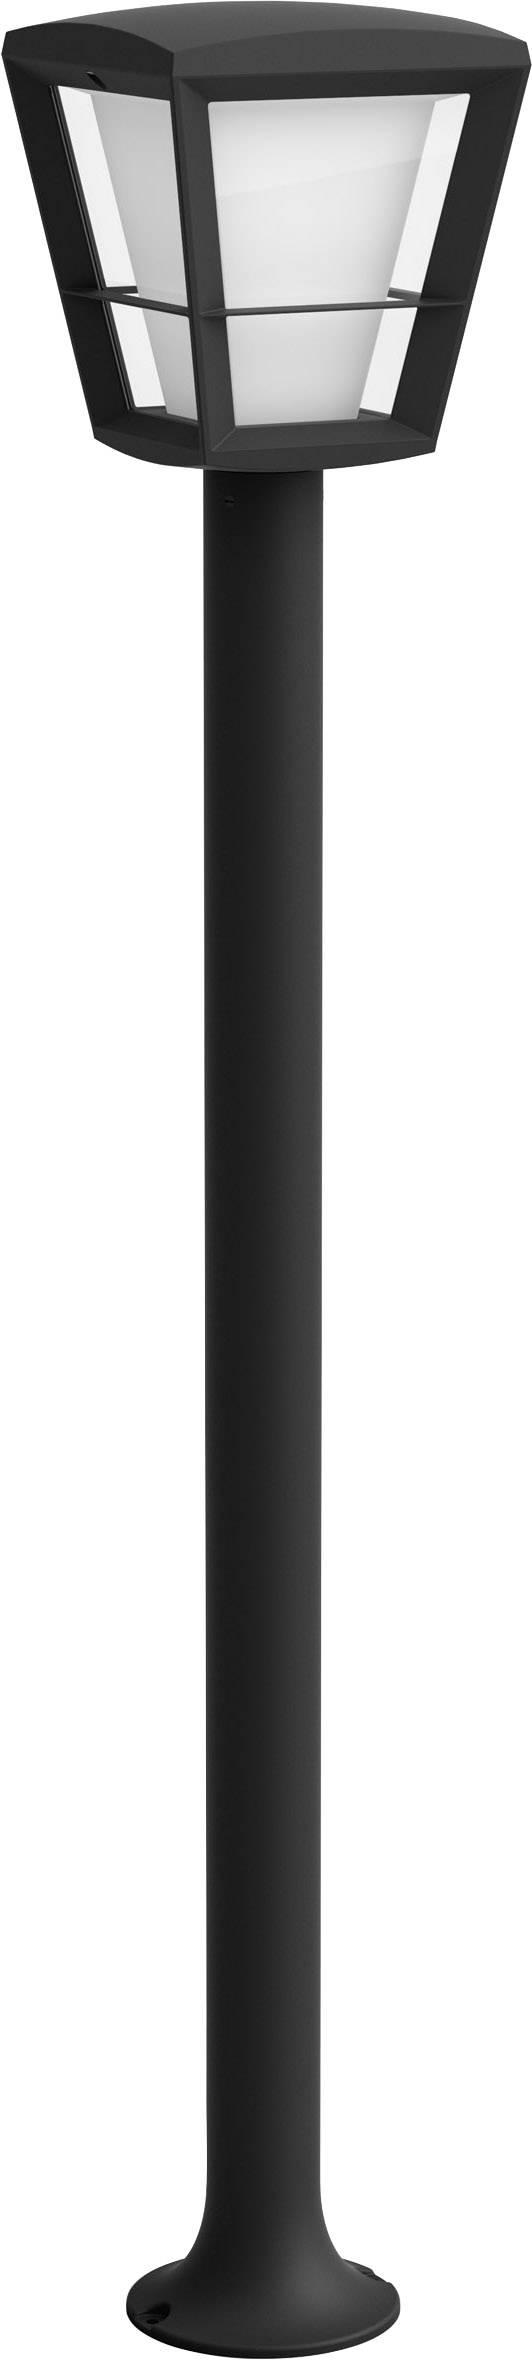 Extérieur Led Hue Econic Lampadaire Philips Lighting Intégrée 15 v0m8yNnwO